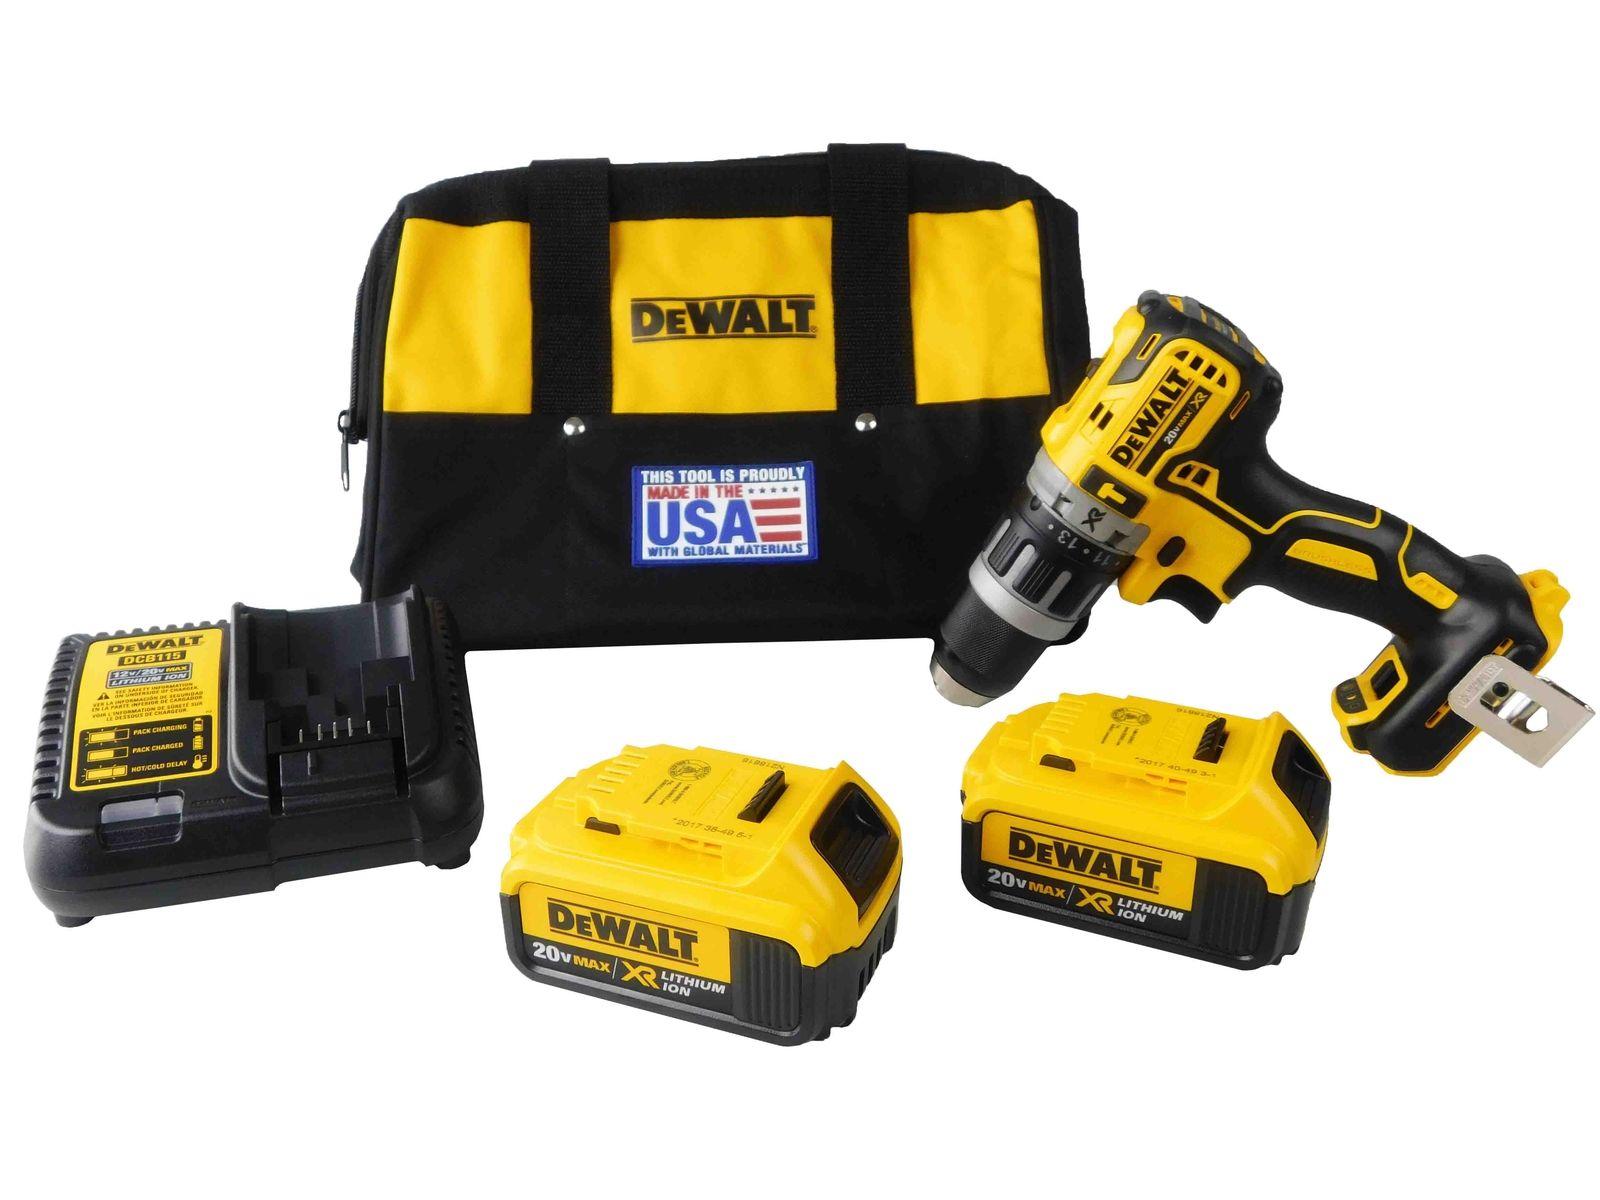 Dewalt-20V-DCD796B-Hammer-Drill-DCB204-4-Ah-Battery-DCB115-Battery-Charger-Bag-image-1